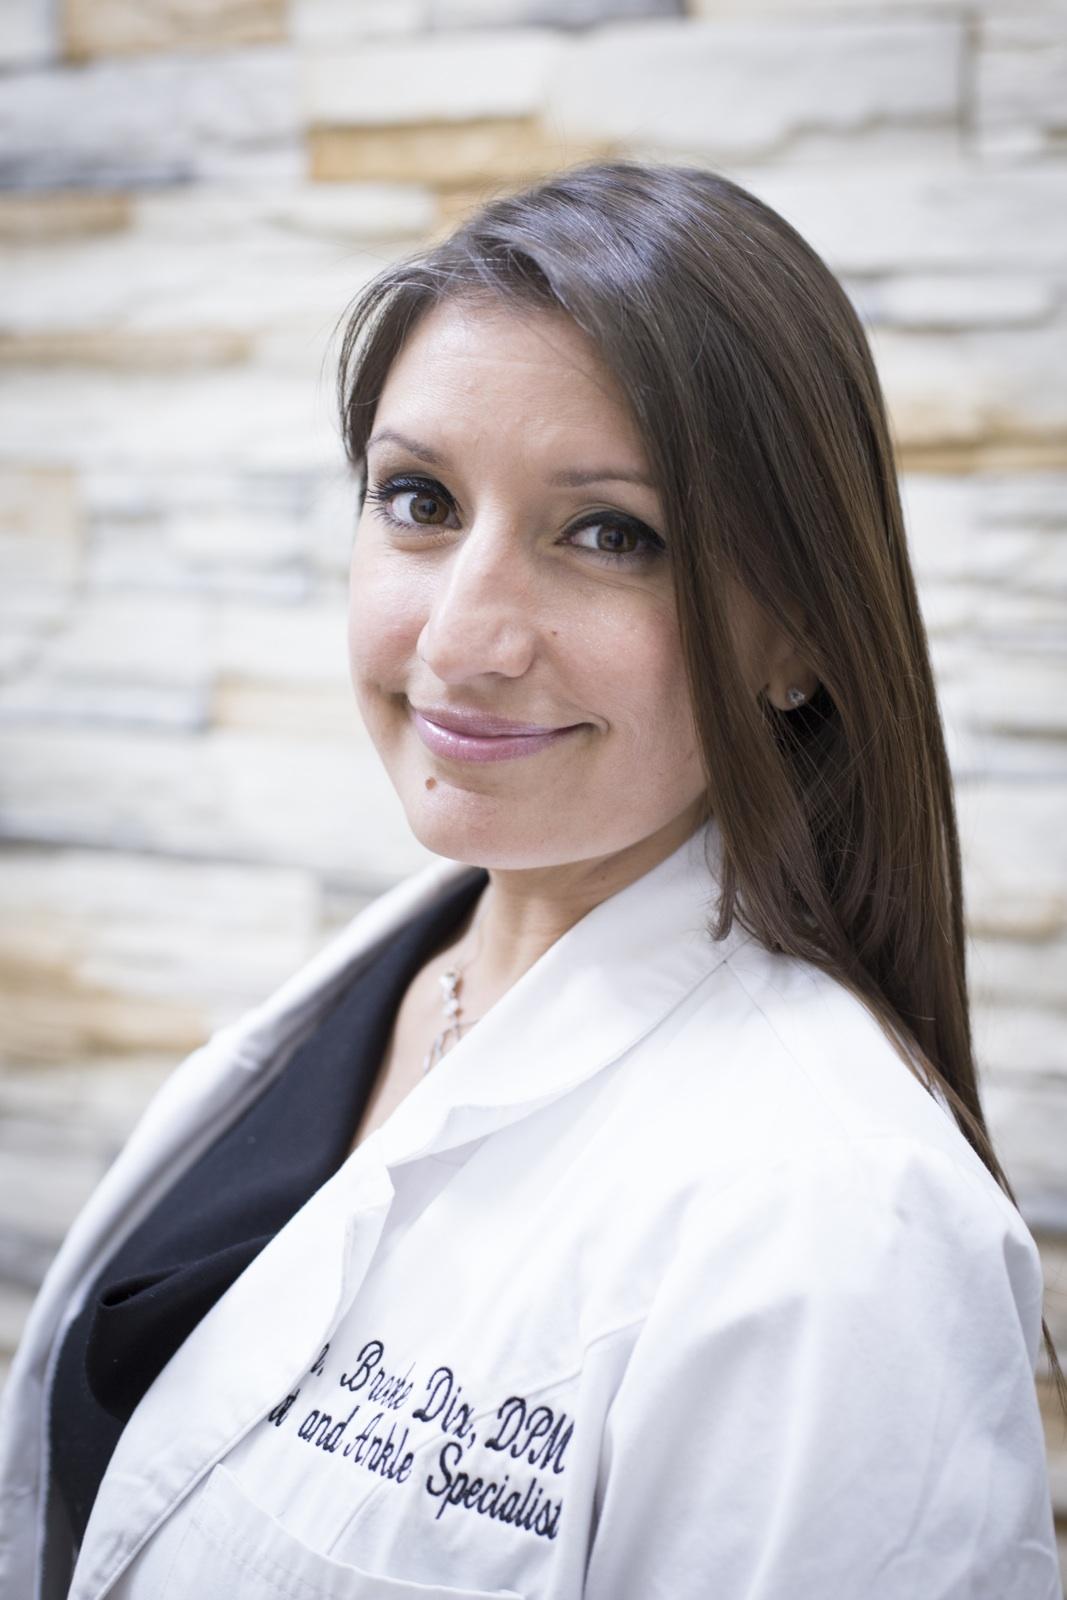 Dr. Brooke M Dix DPM